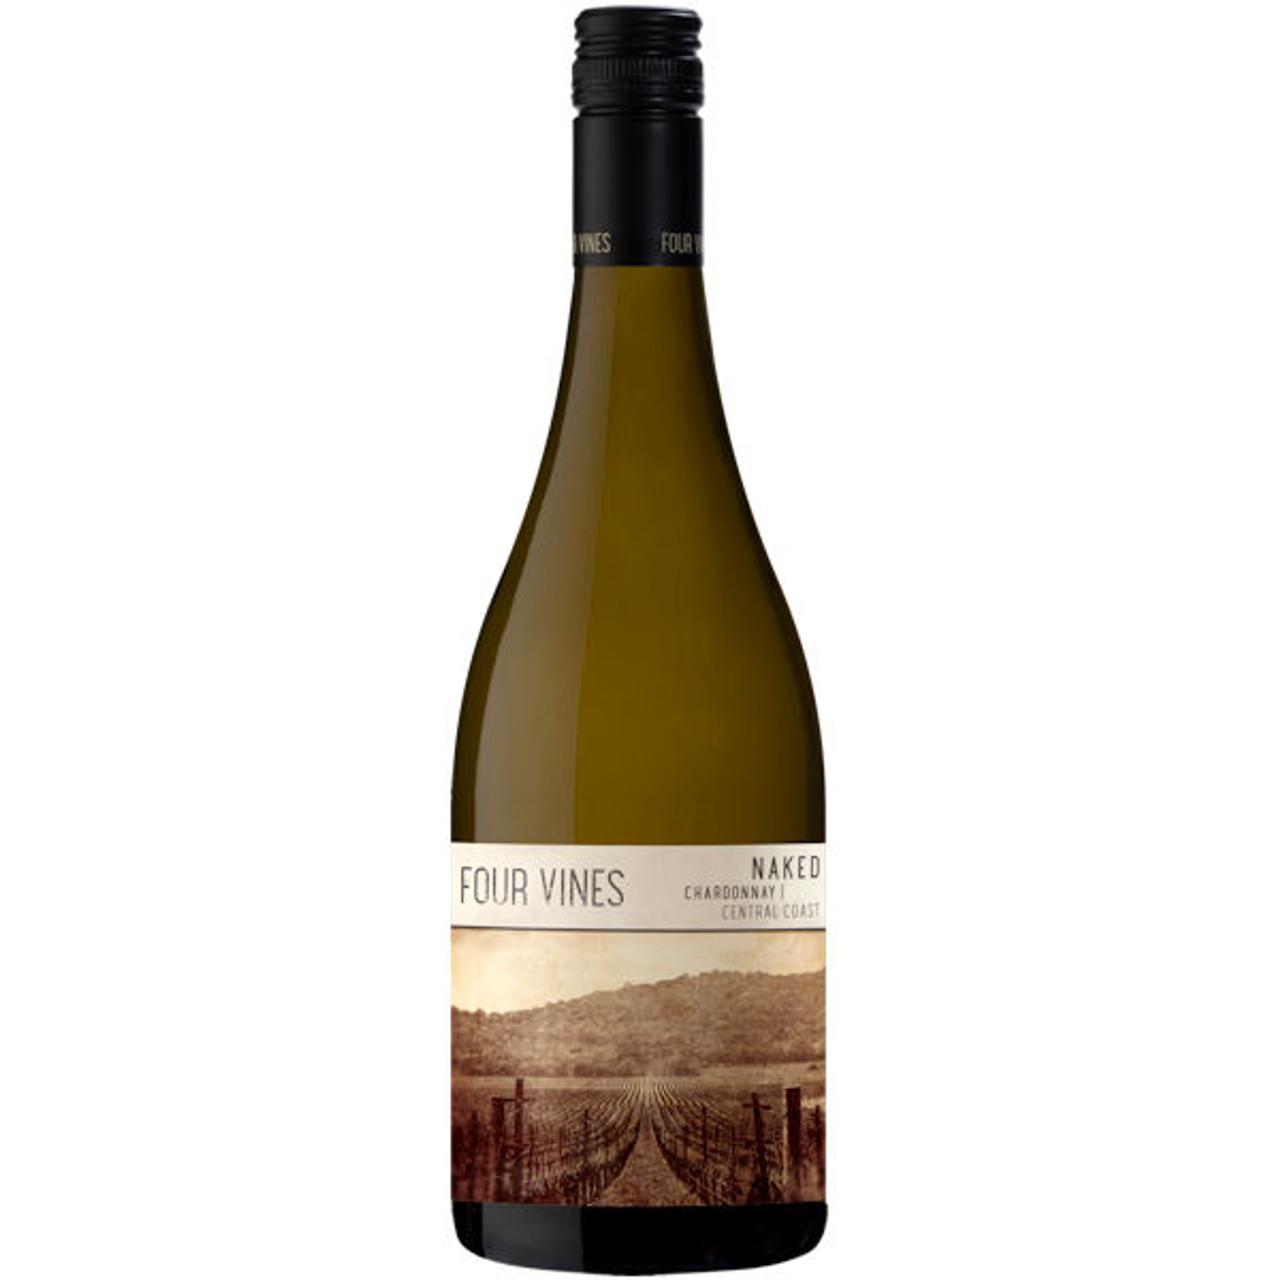 Four Vines Naked Central Coast Chardonnay